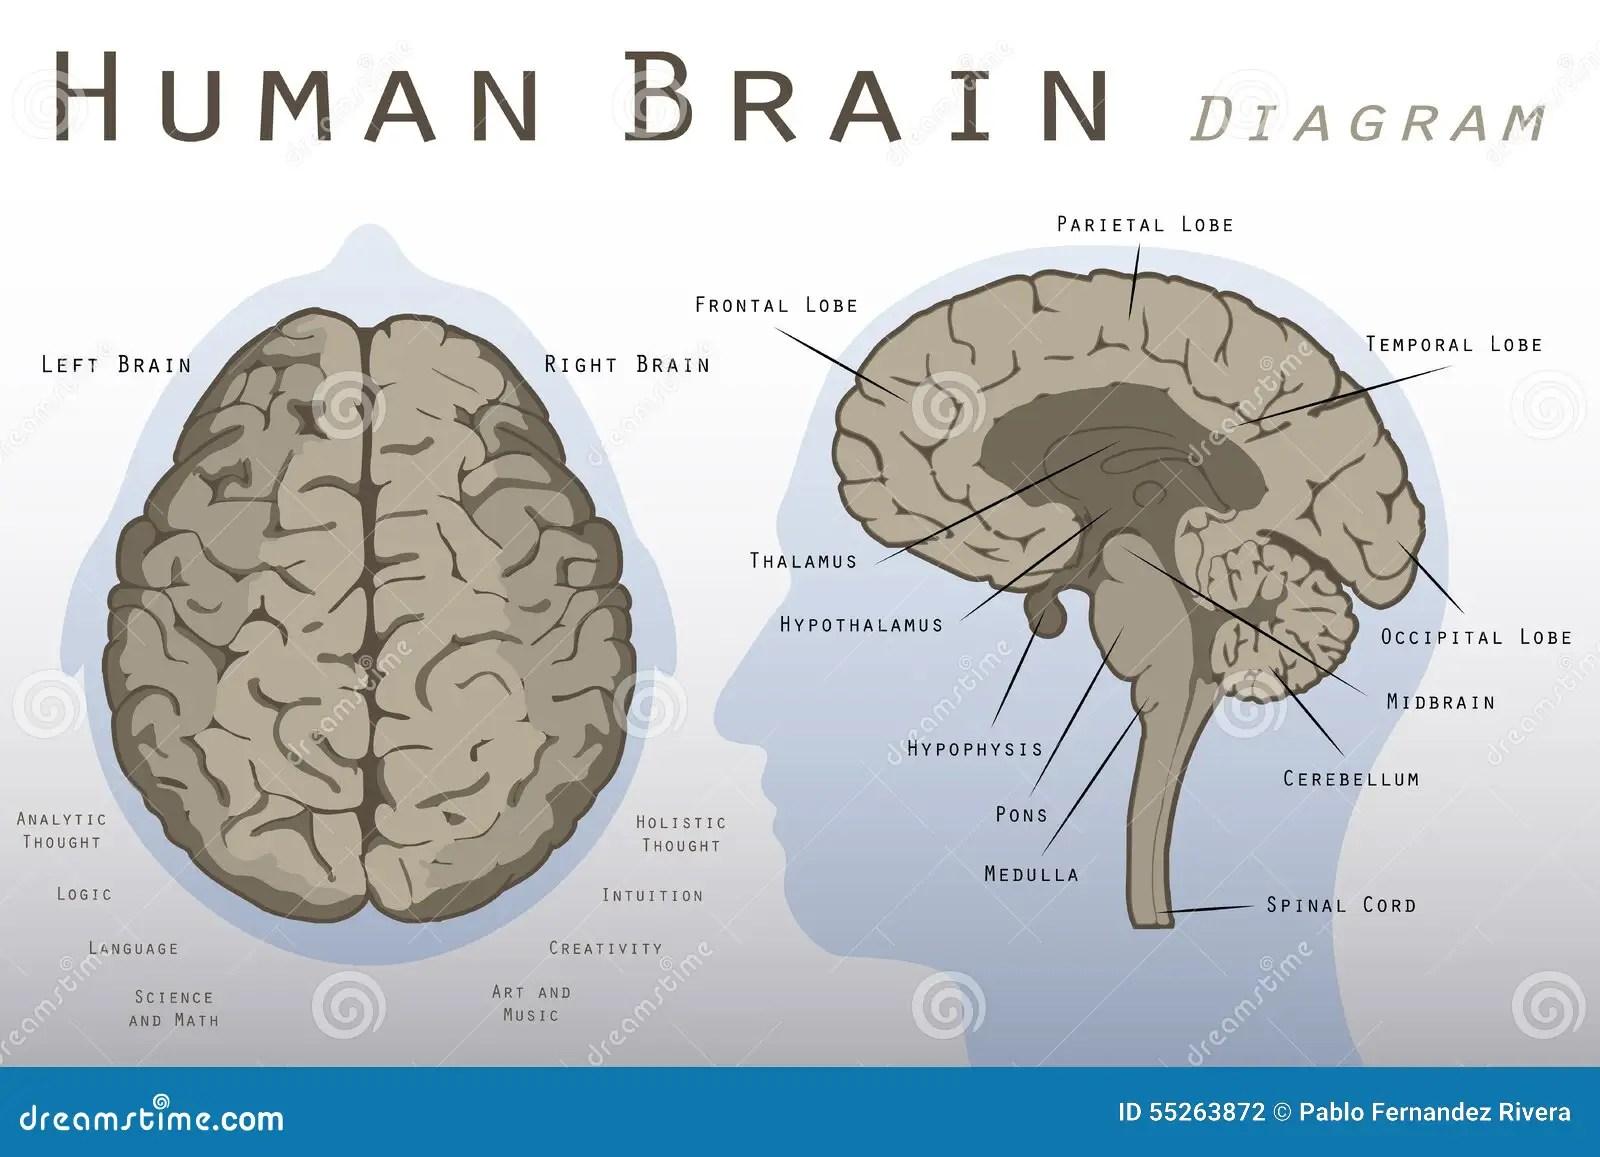 Human Brain Diagram Stock Illustration